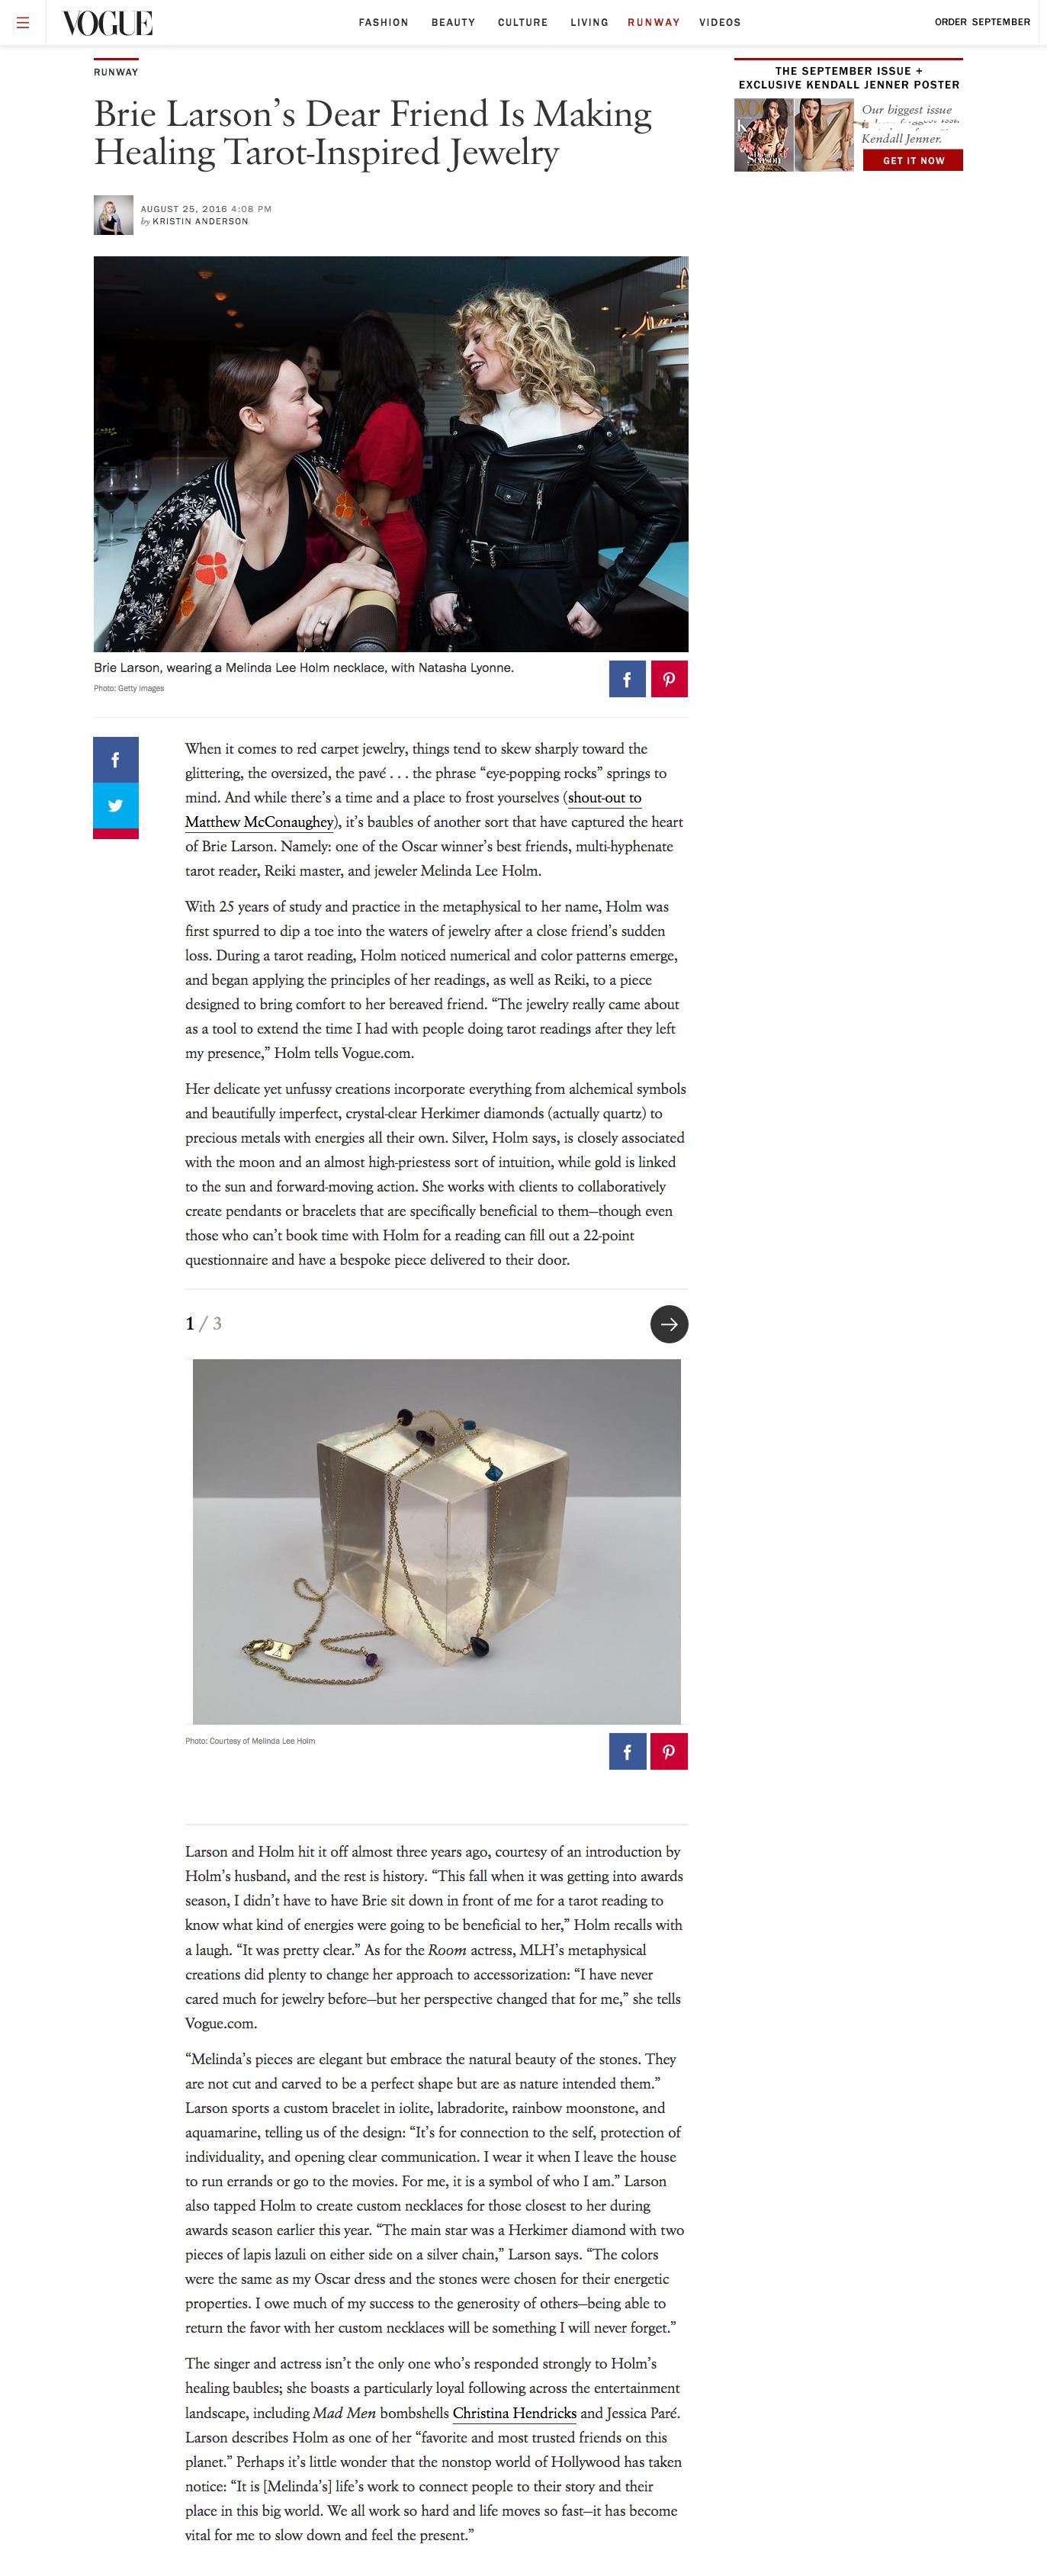 Brie Larson's Dear Friend Is Making Healing Tarot-Inspired Jewelry   Vogue August 25, 2016